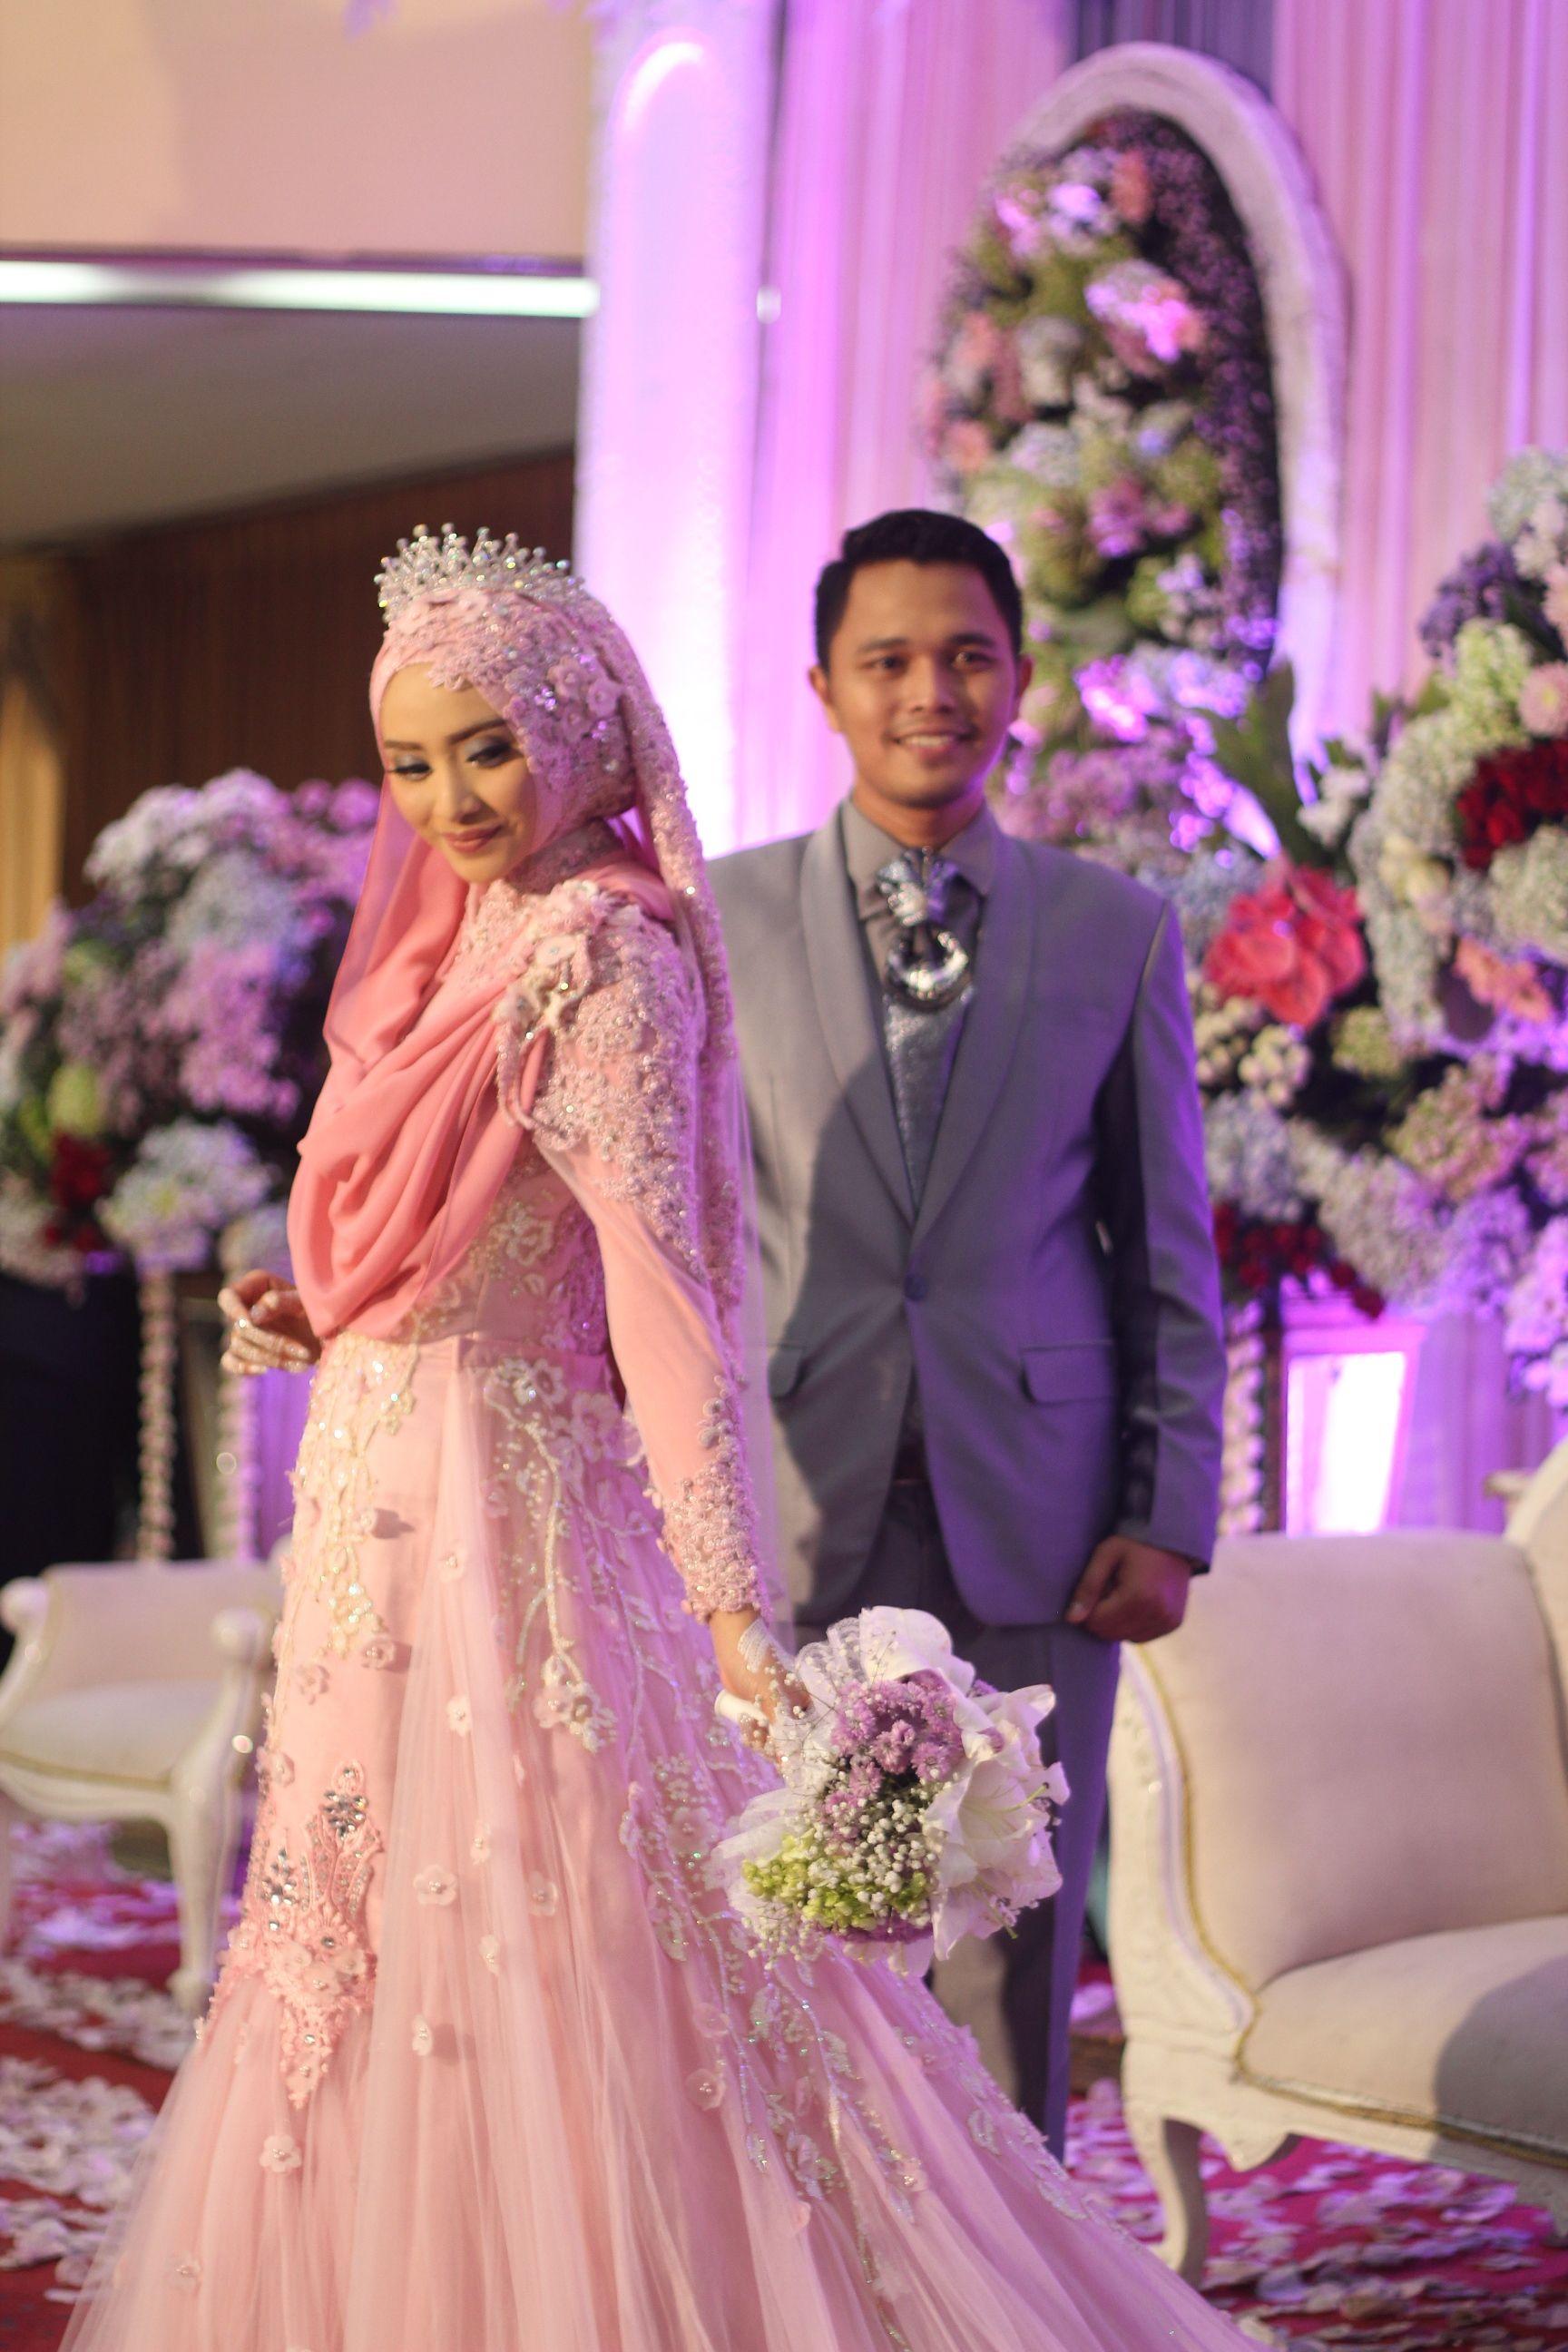 Pin de N sarwestri en wedding | Pinterest